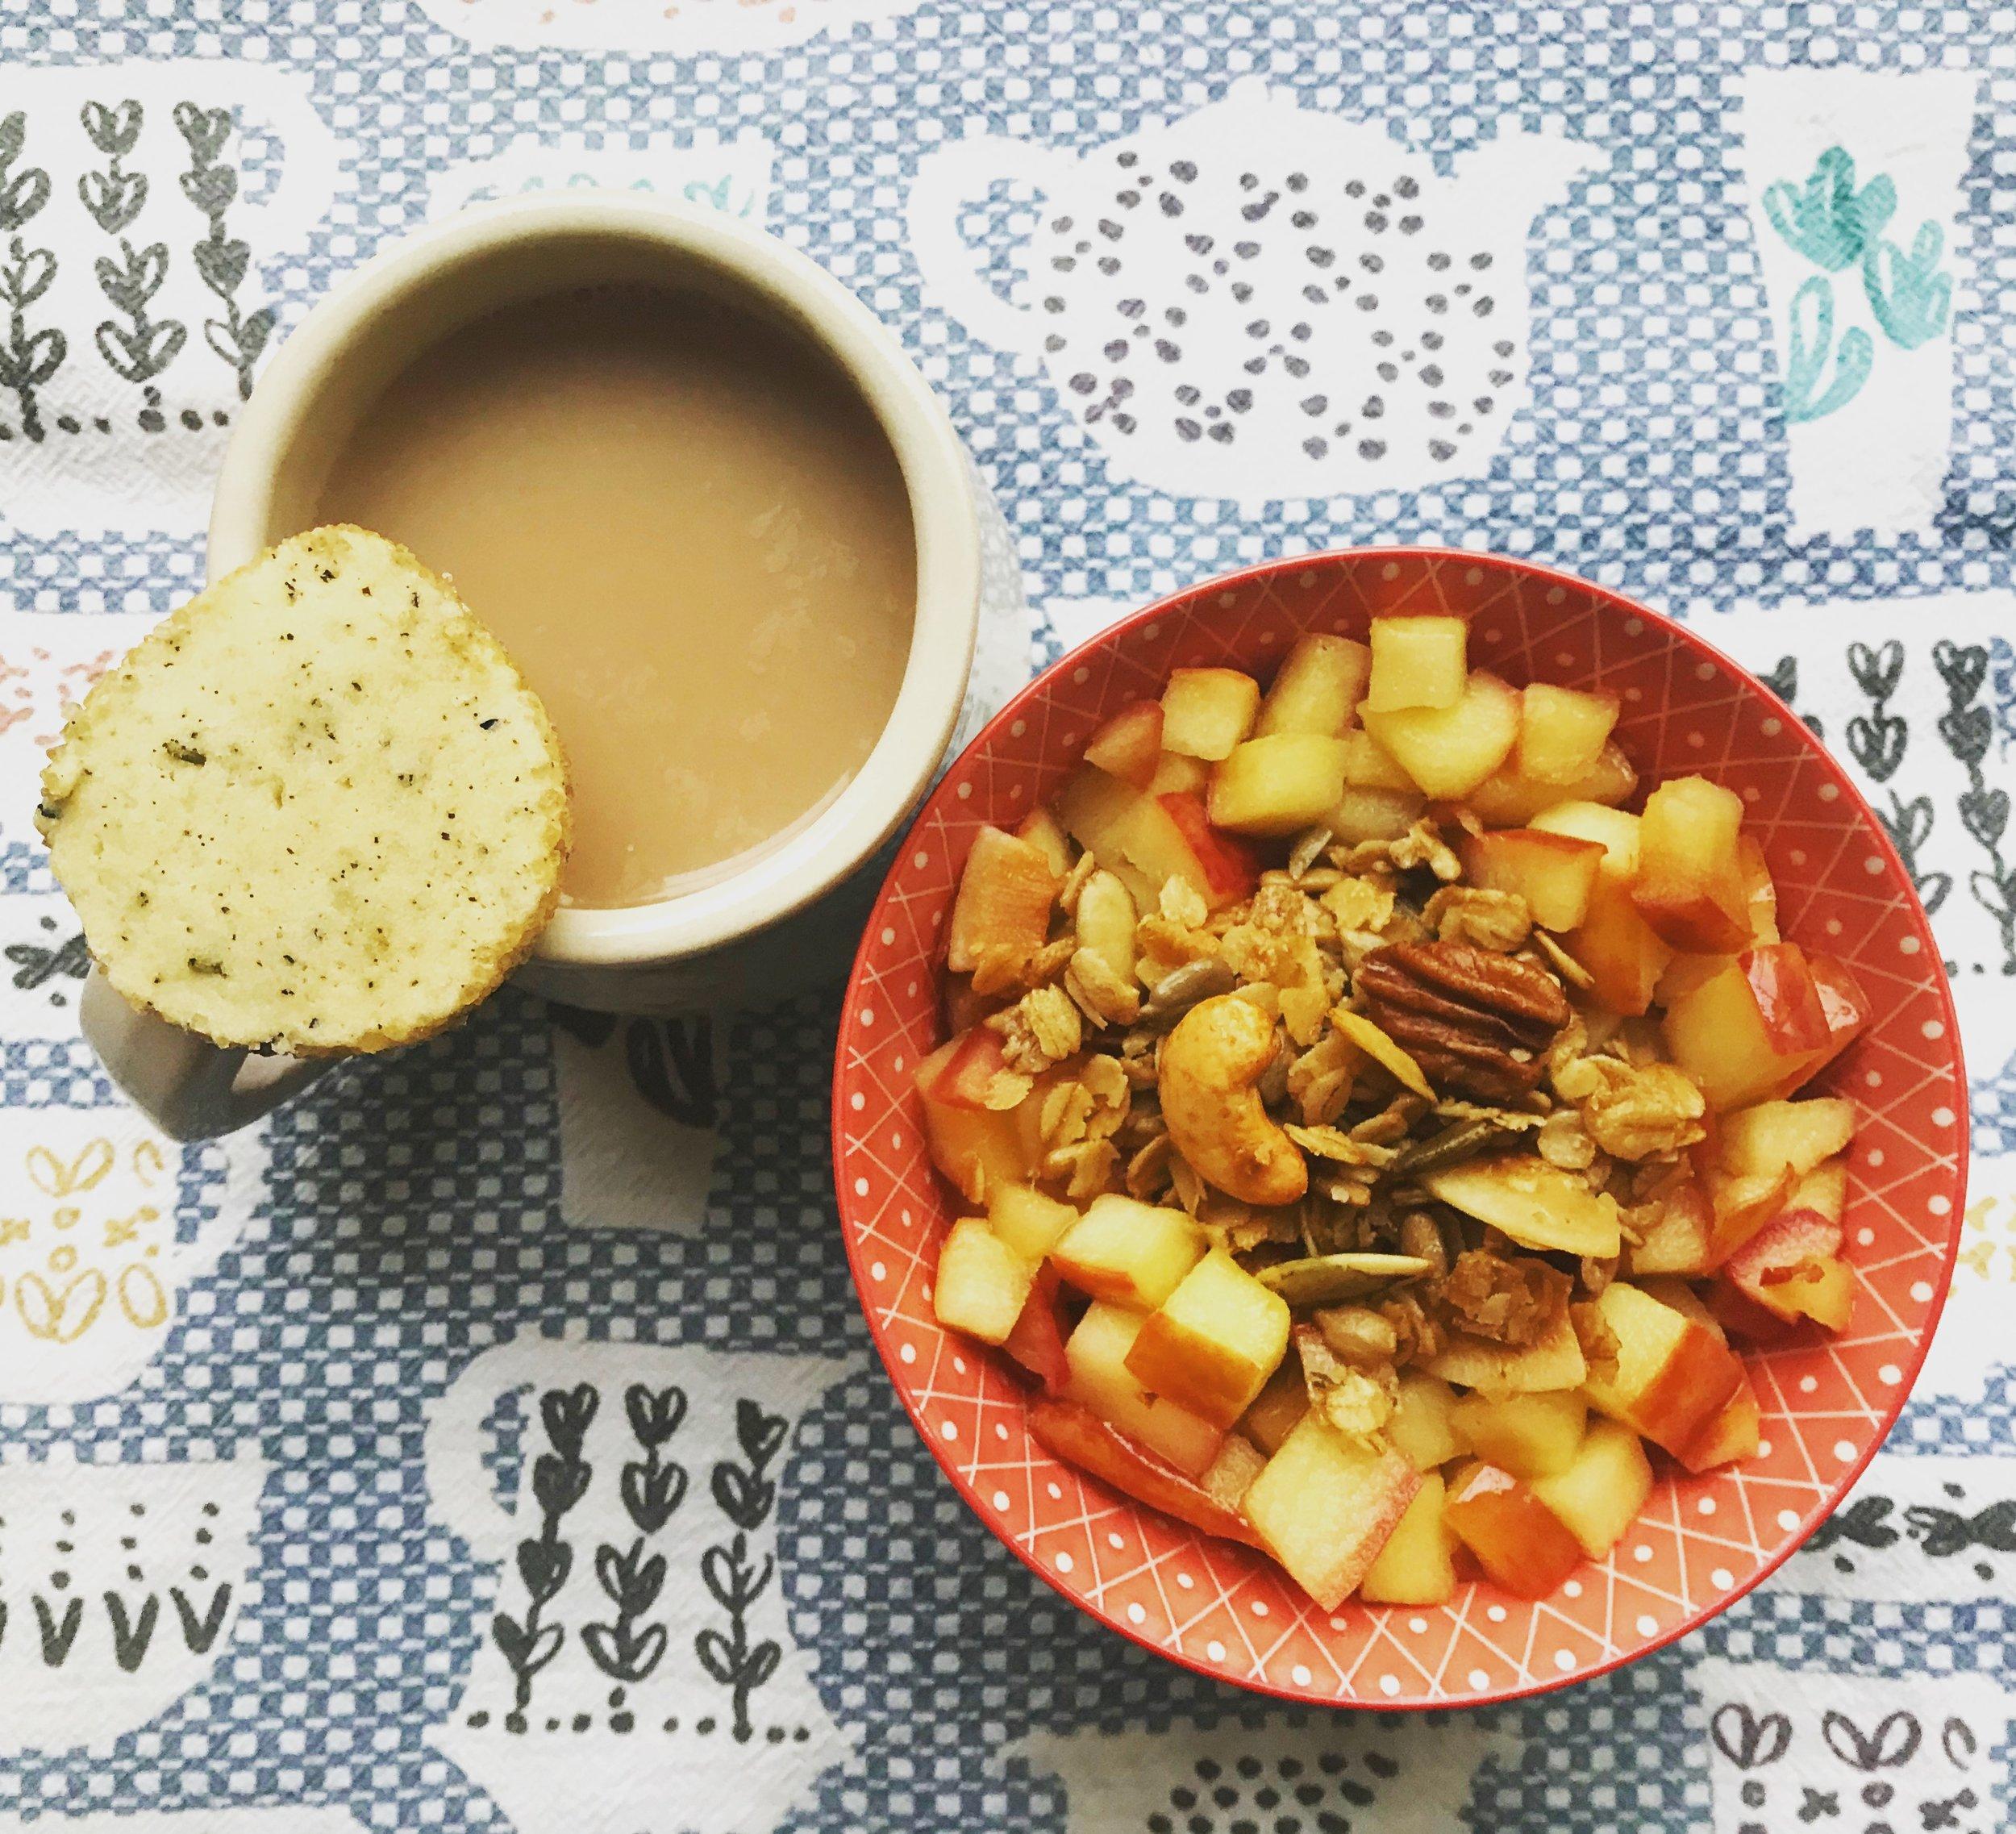 Sautéed Apples with Granola